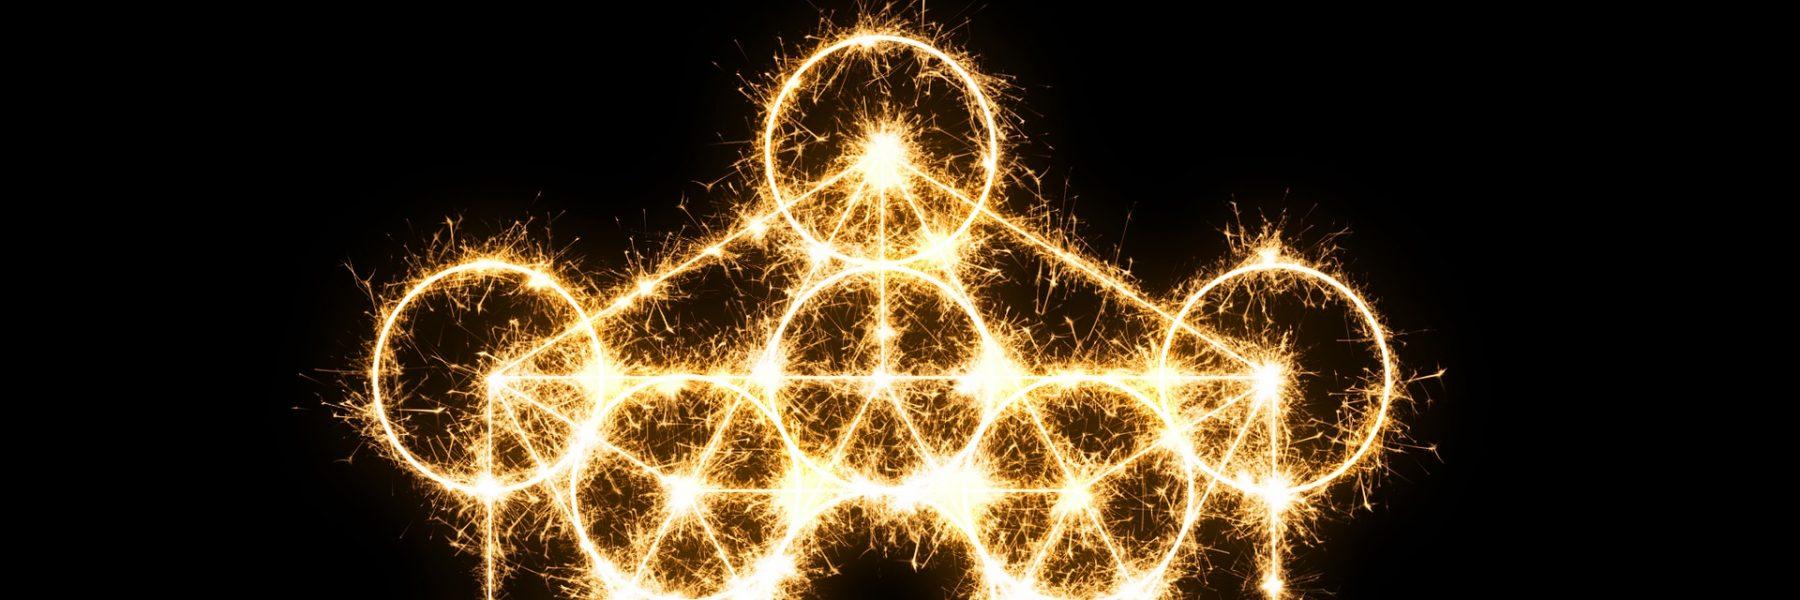 Astrologie magique